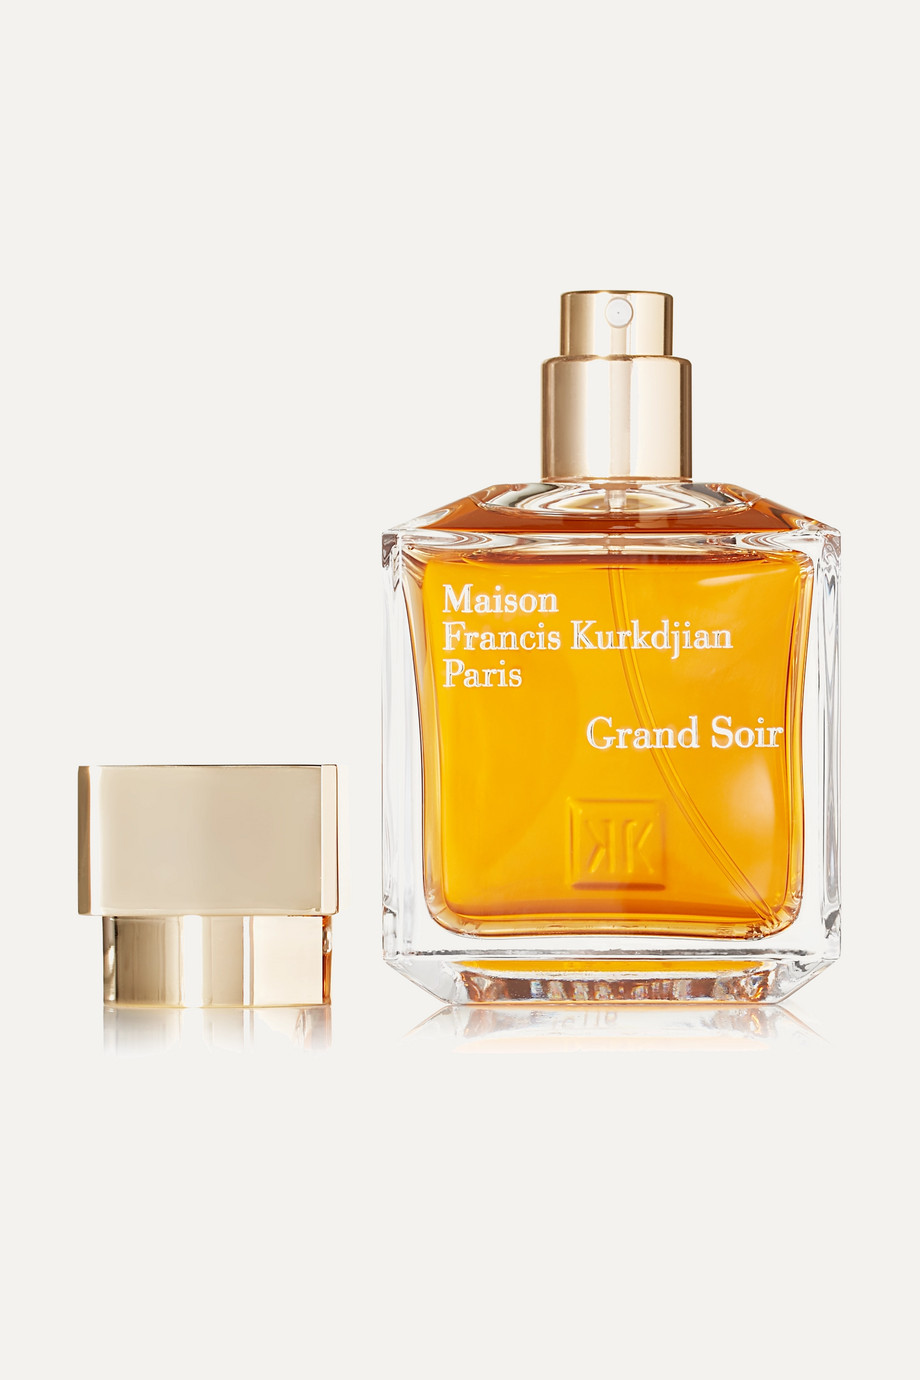 Maison Francis Kurkdjian Grand Soir Eau de Parfum, 70ml